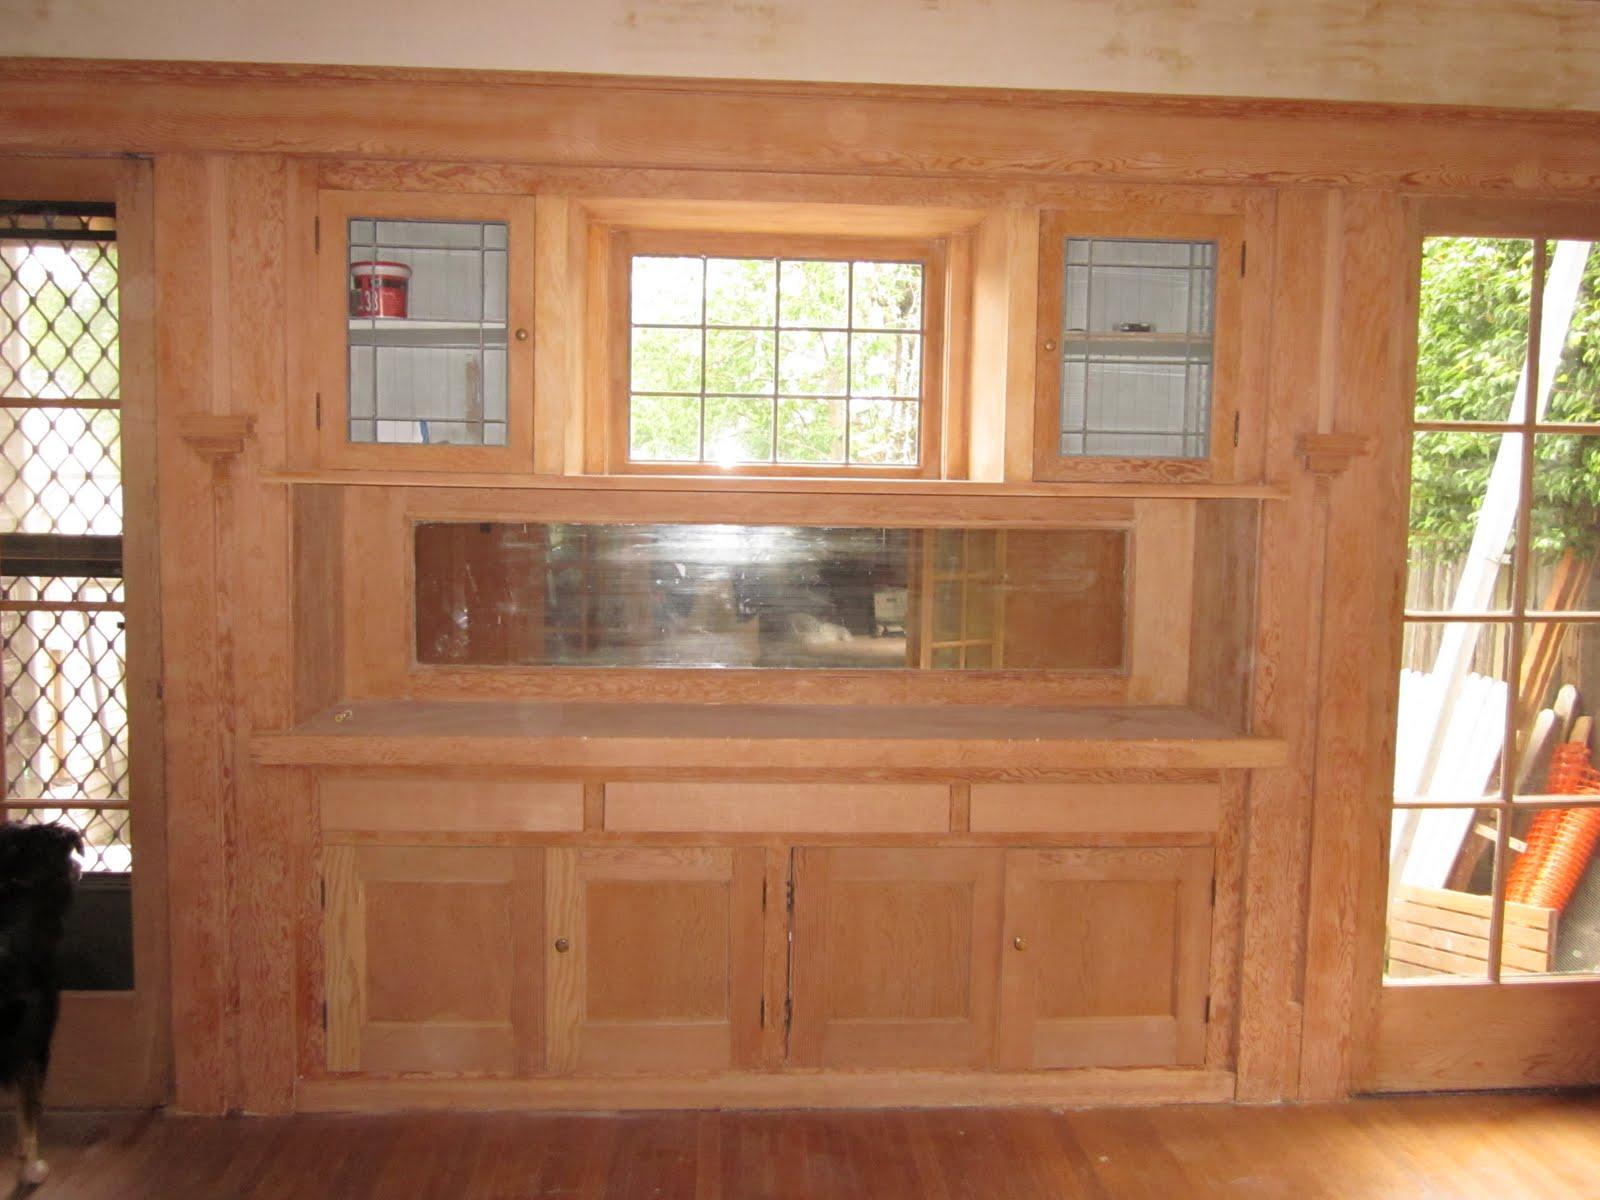 Laurelhurst Craftsman Bungalow: Dining Room After Photos